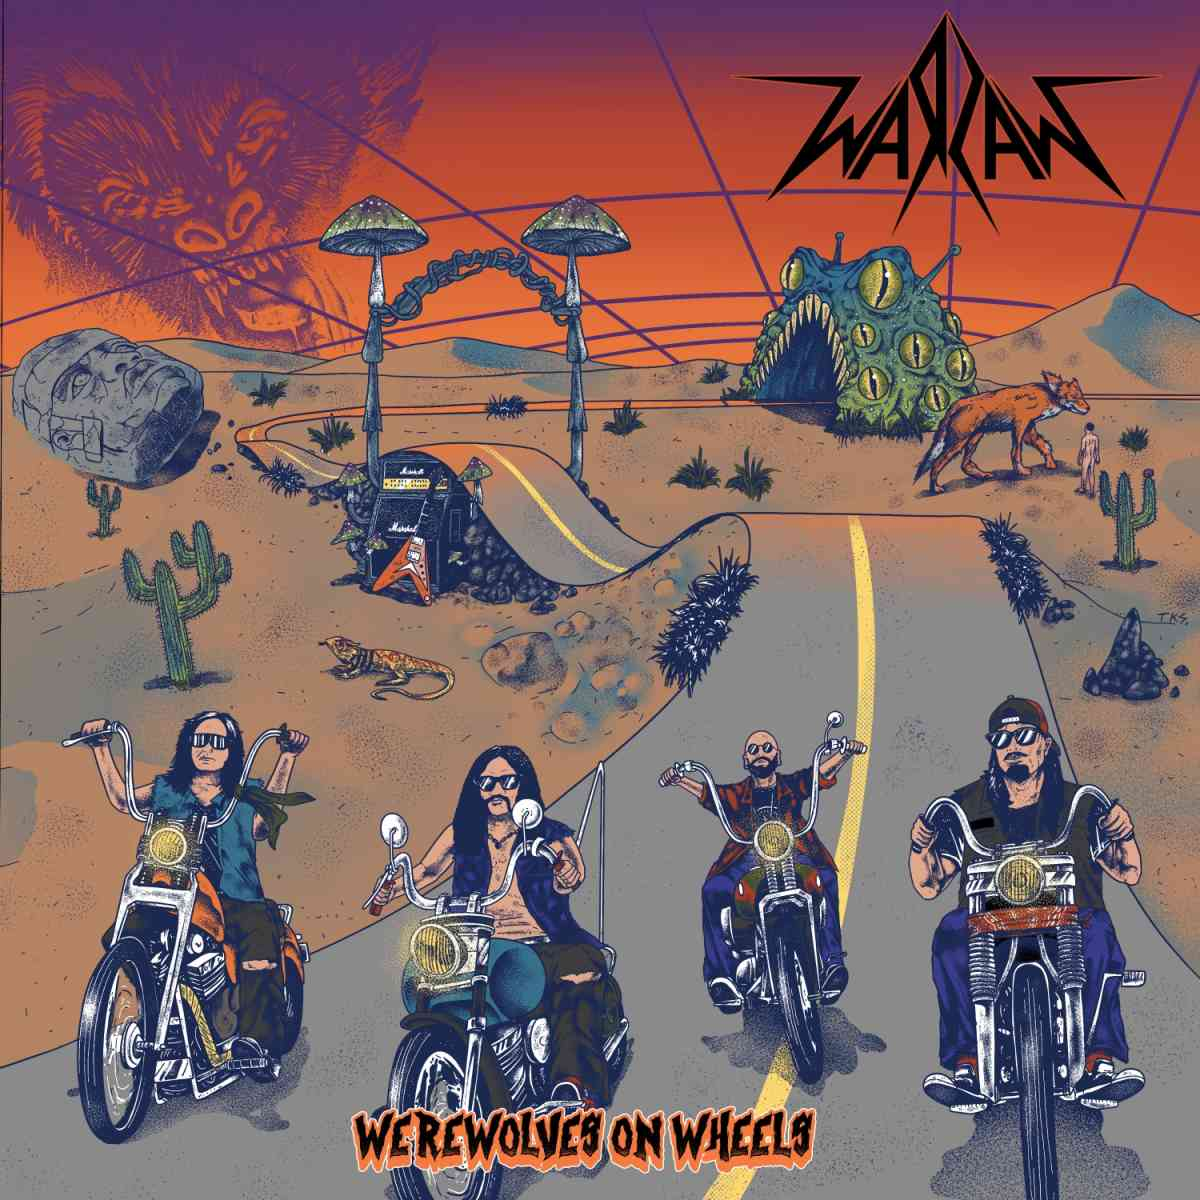 Warzaw - Werewolves on Wheels - album cover